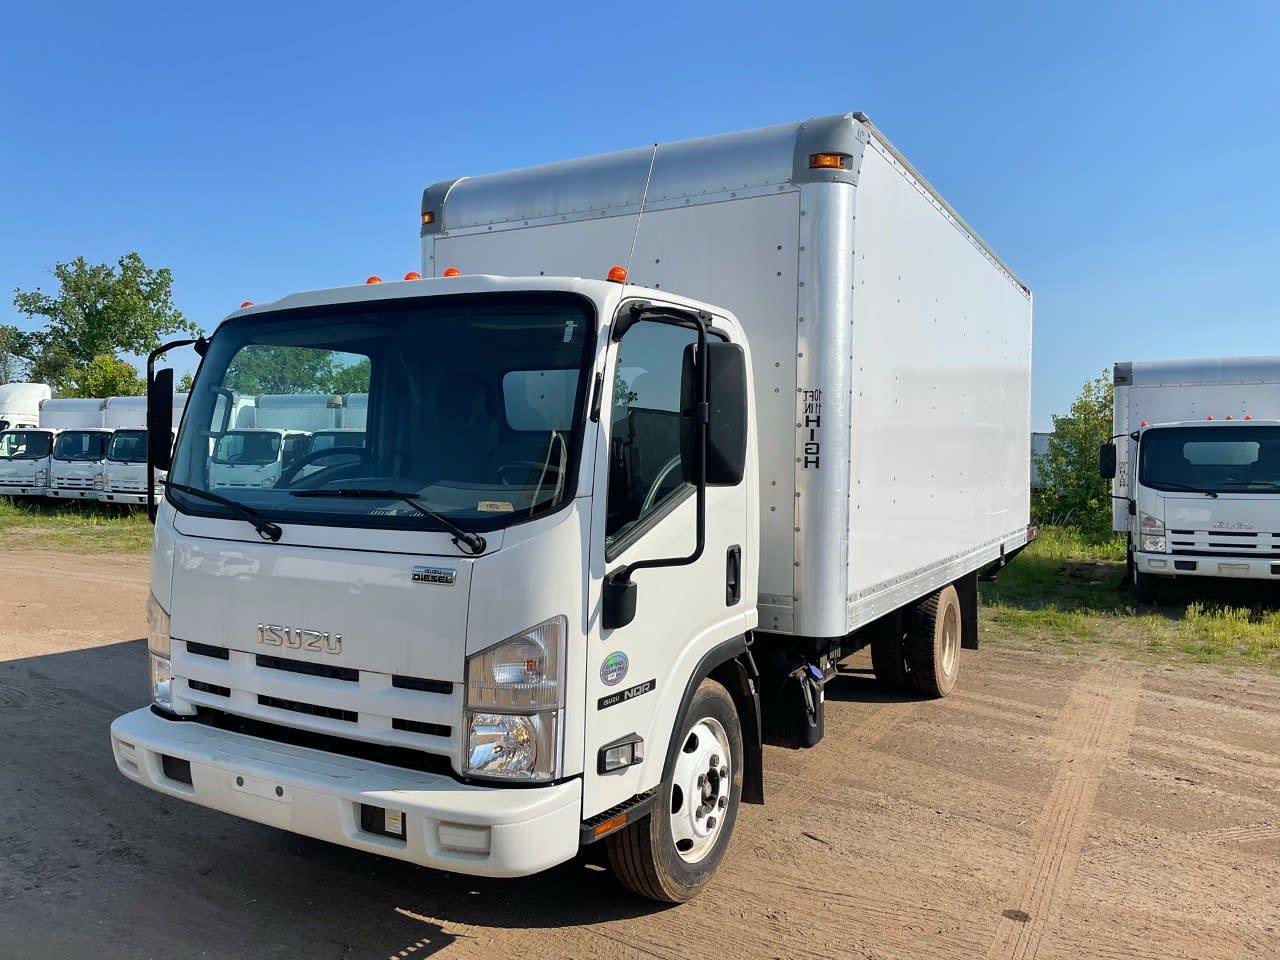 2015 Isuzu NQR Regular Cab 4x2, Dry Freight #650476 - photo 1